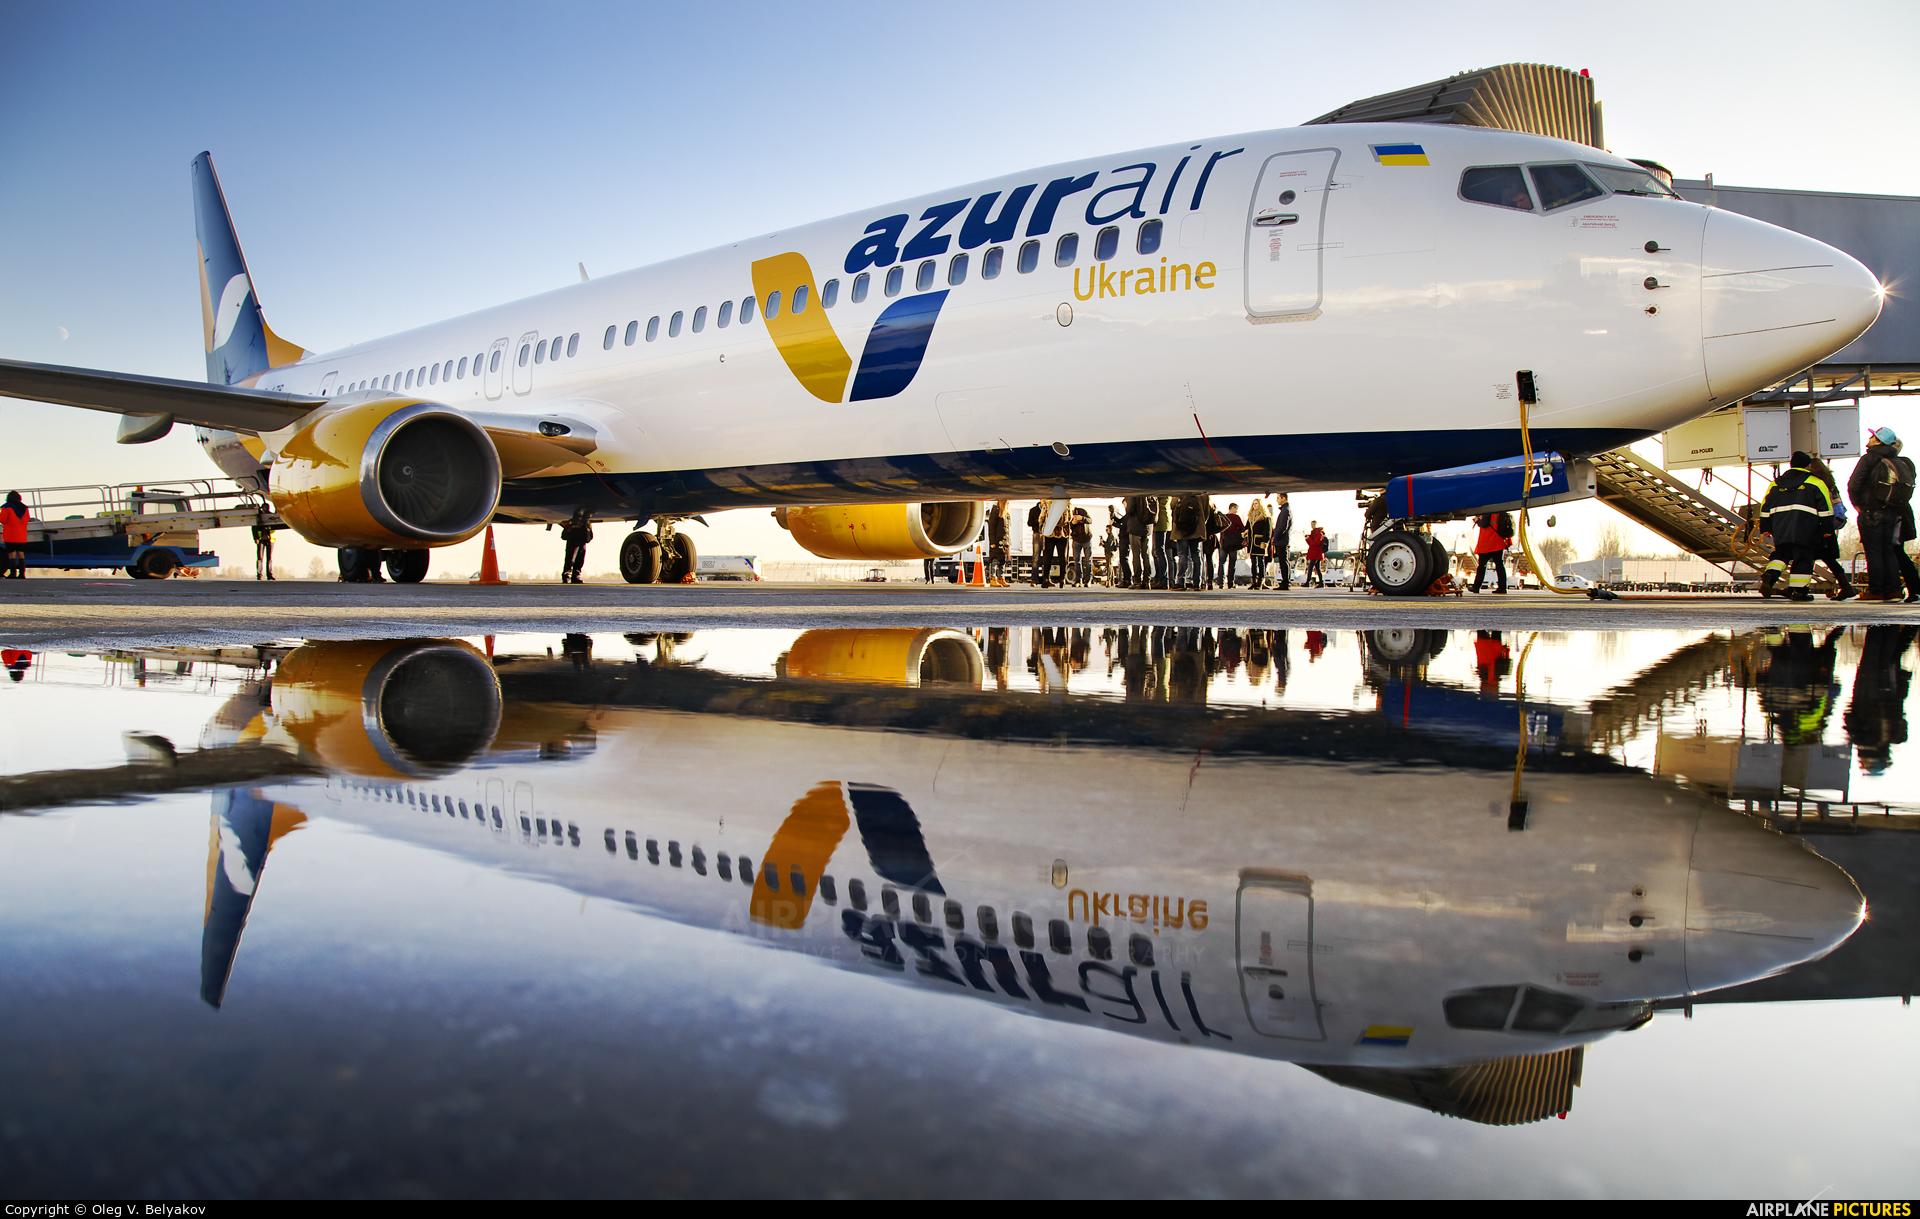 Azur Air Ukraine UR-AZB aircraft at Kiev - Borispol